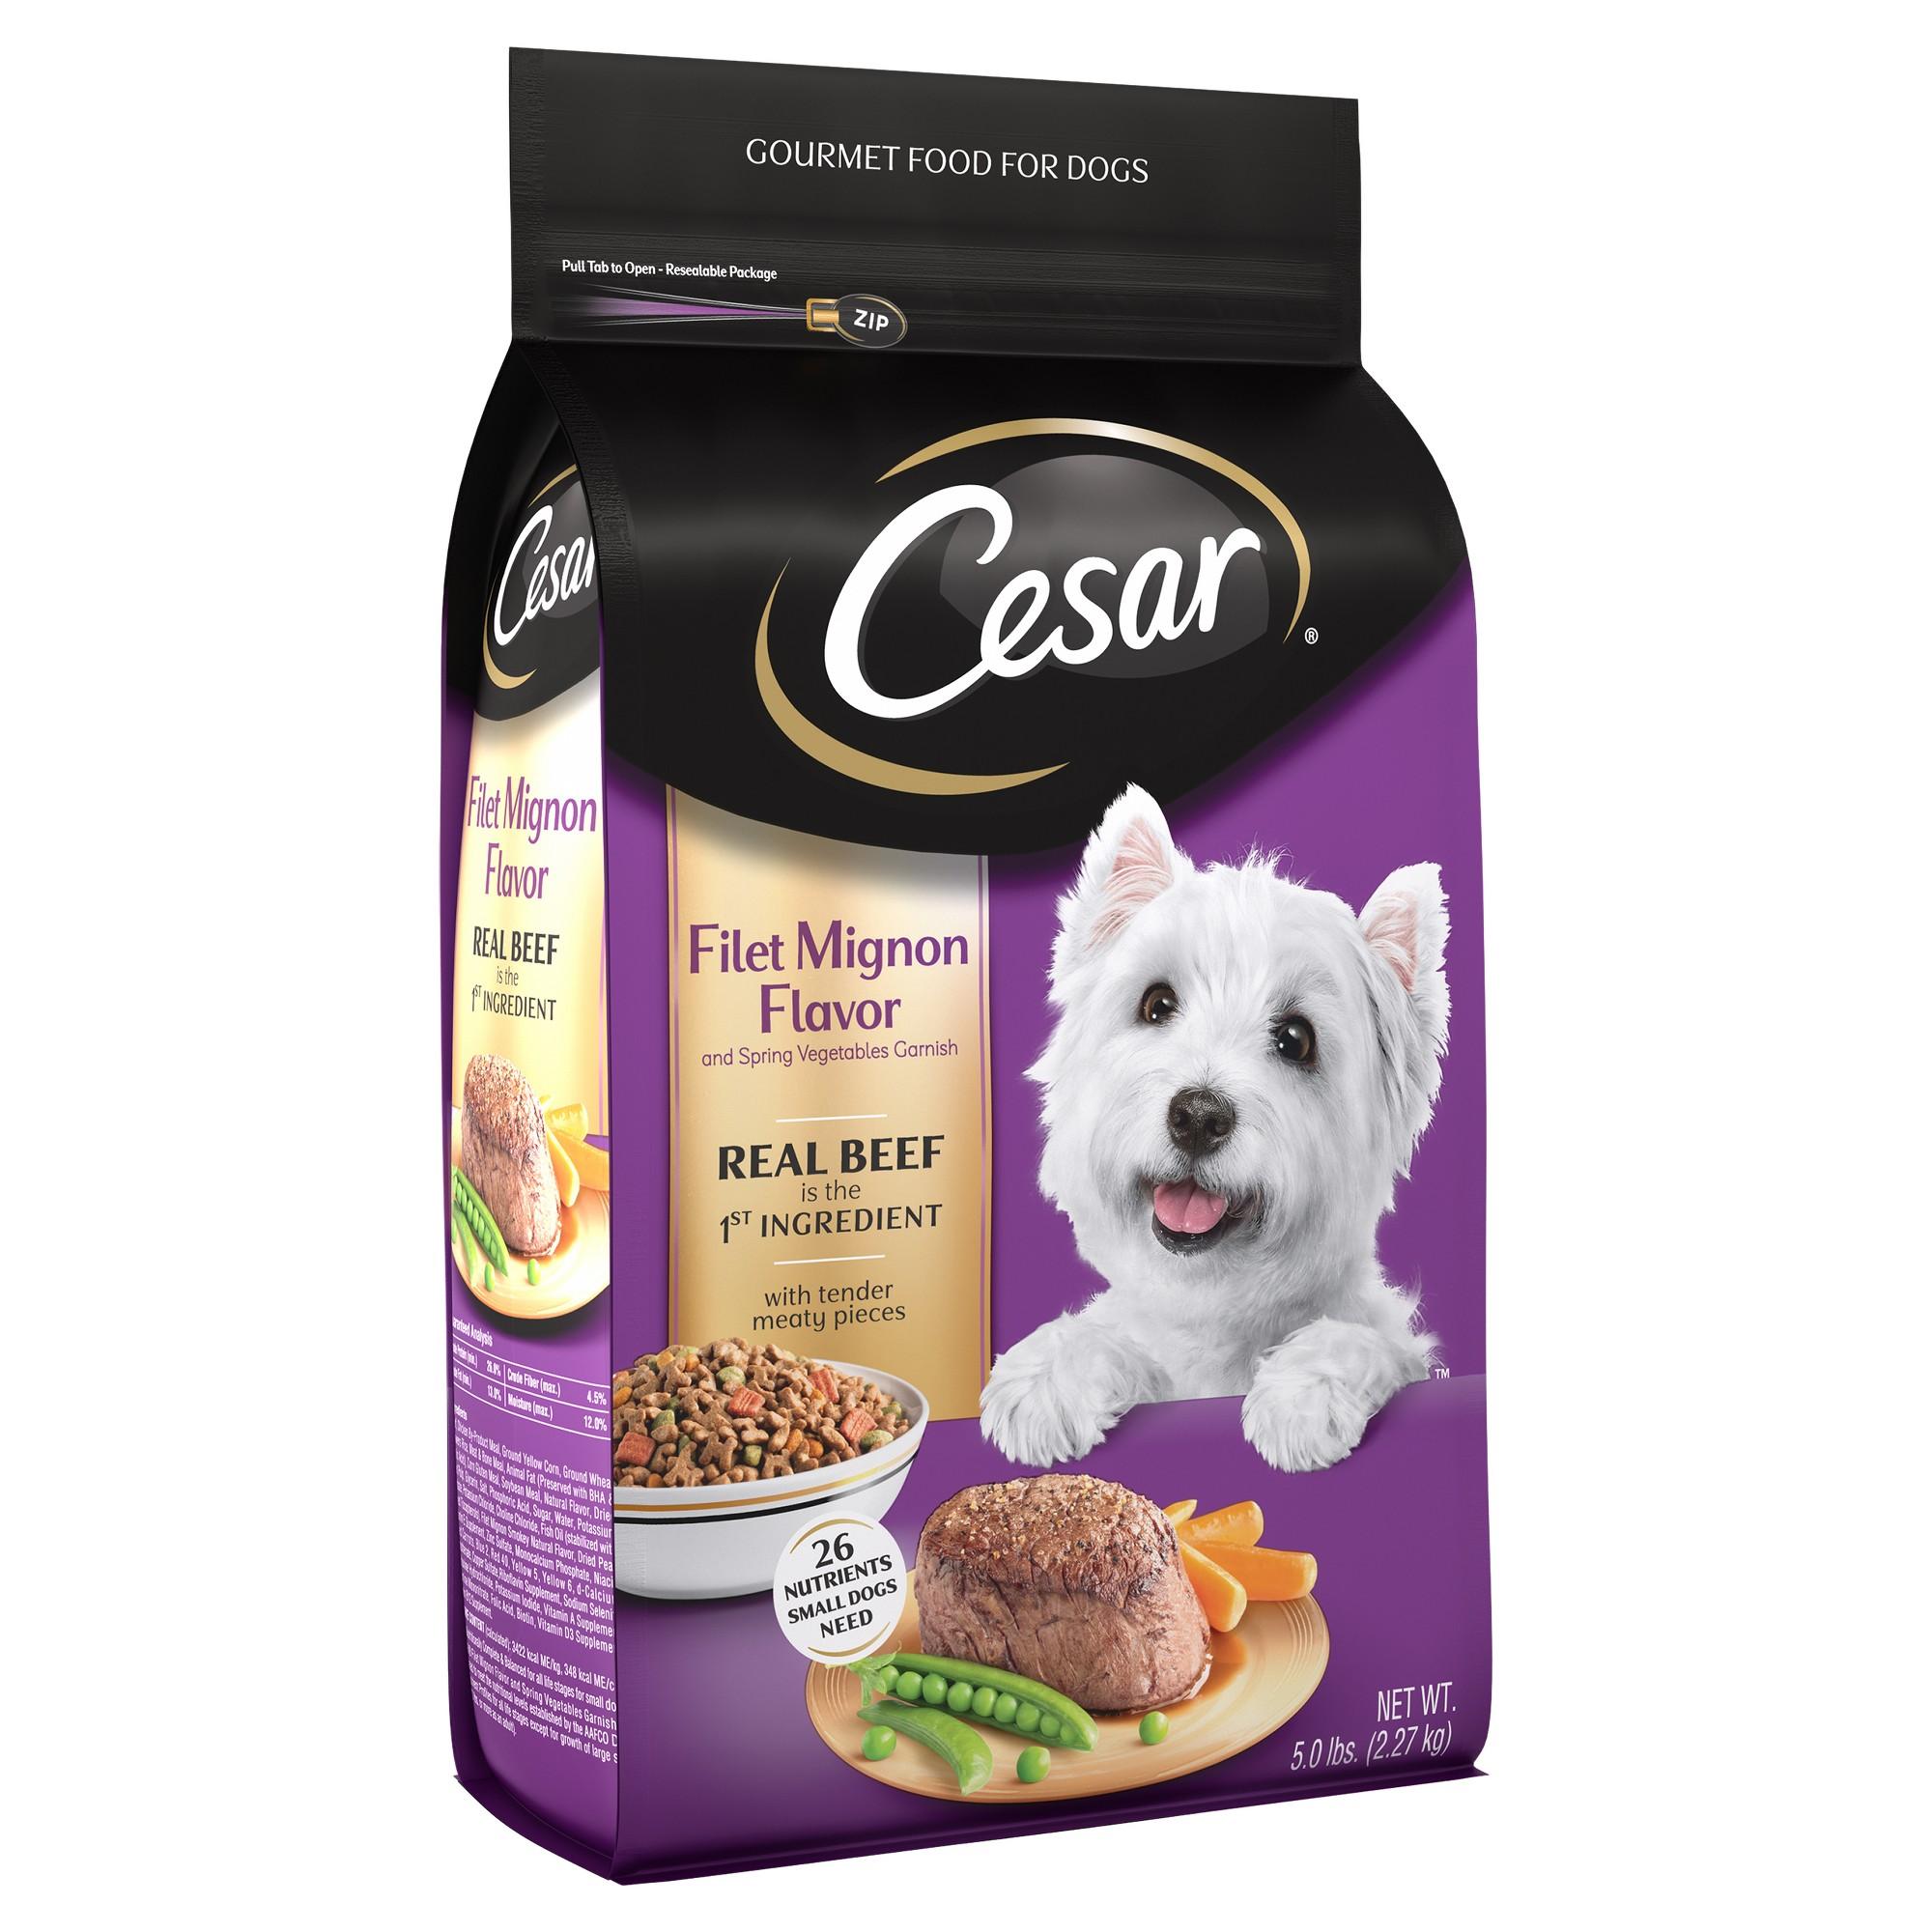 Cesar Filet Mignon Flavor With Spring Vegetables Dry Dog Food